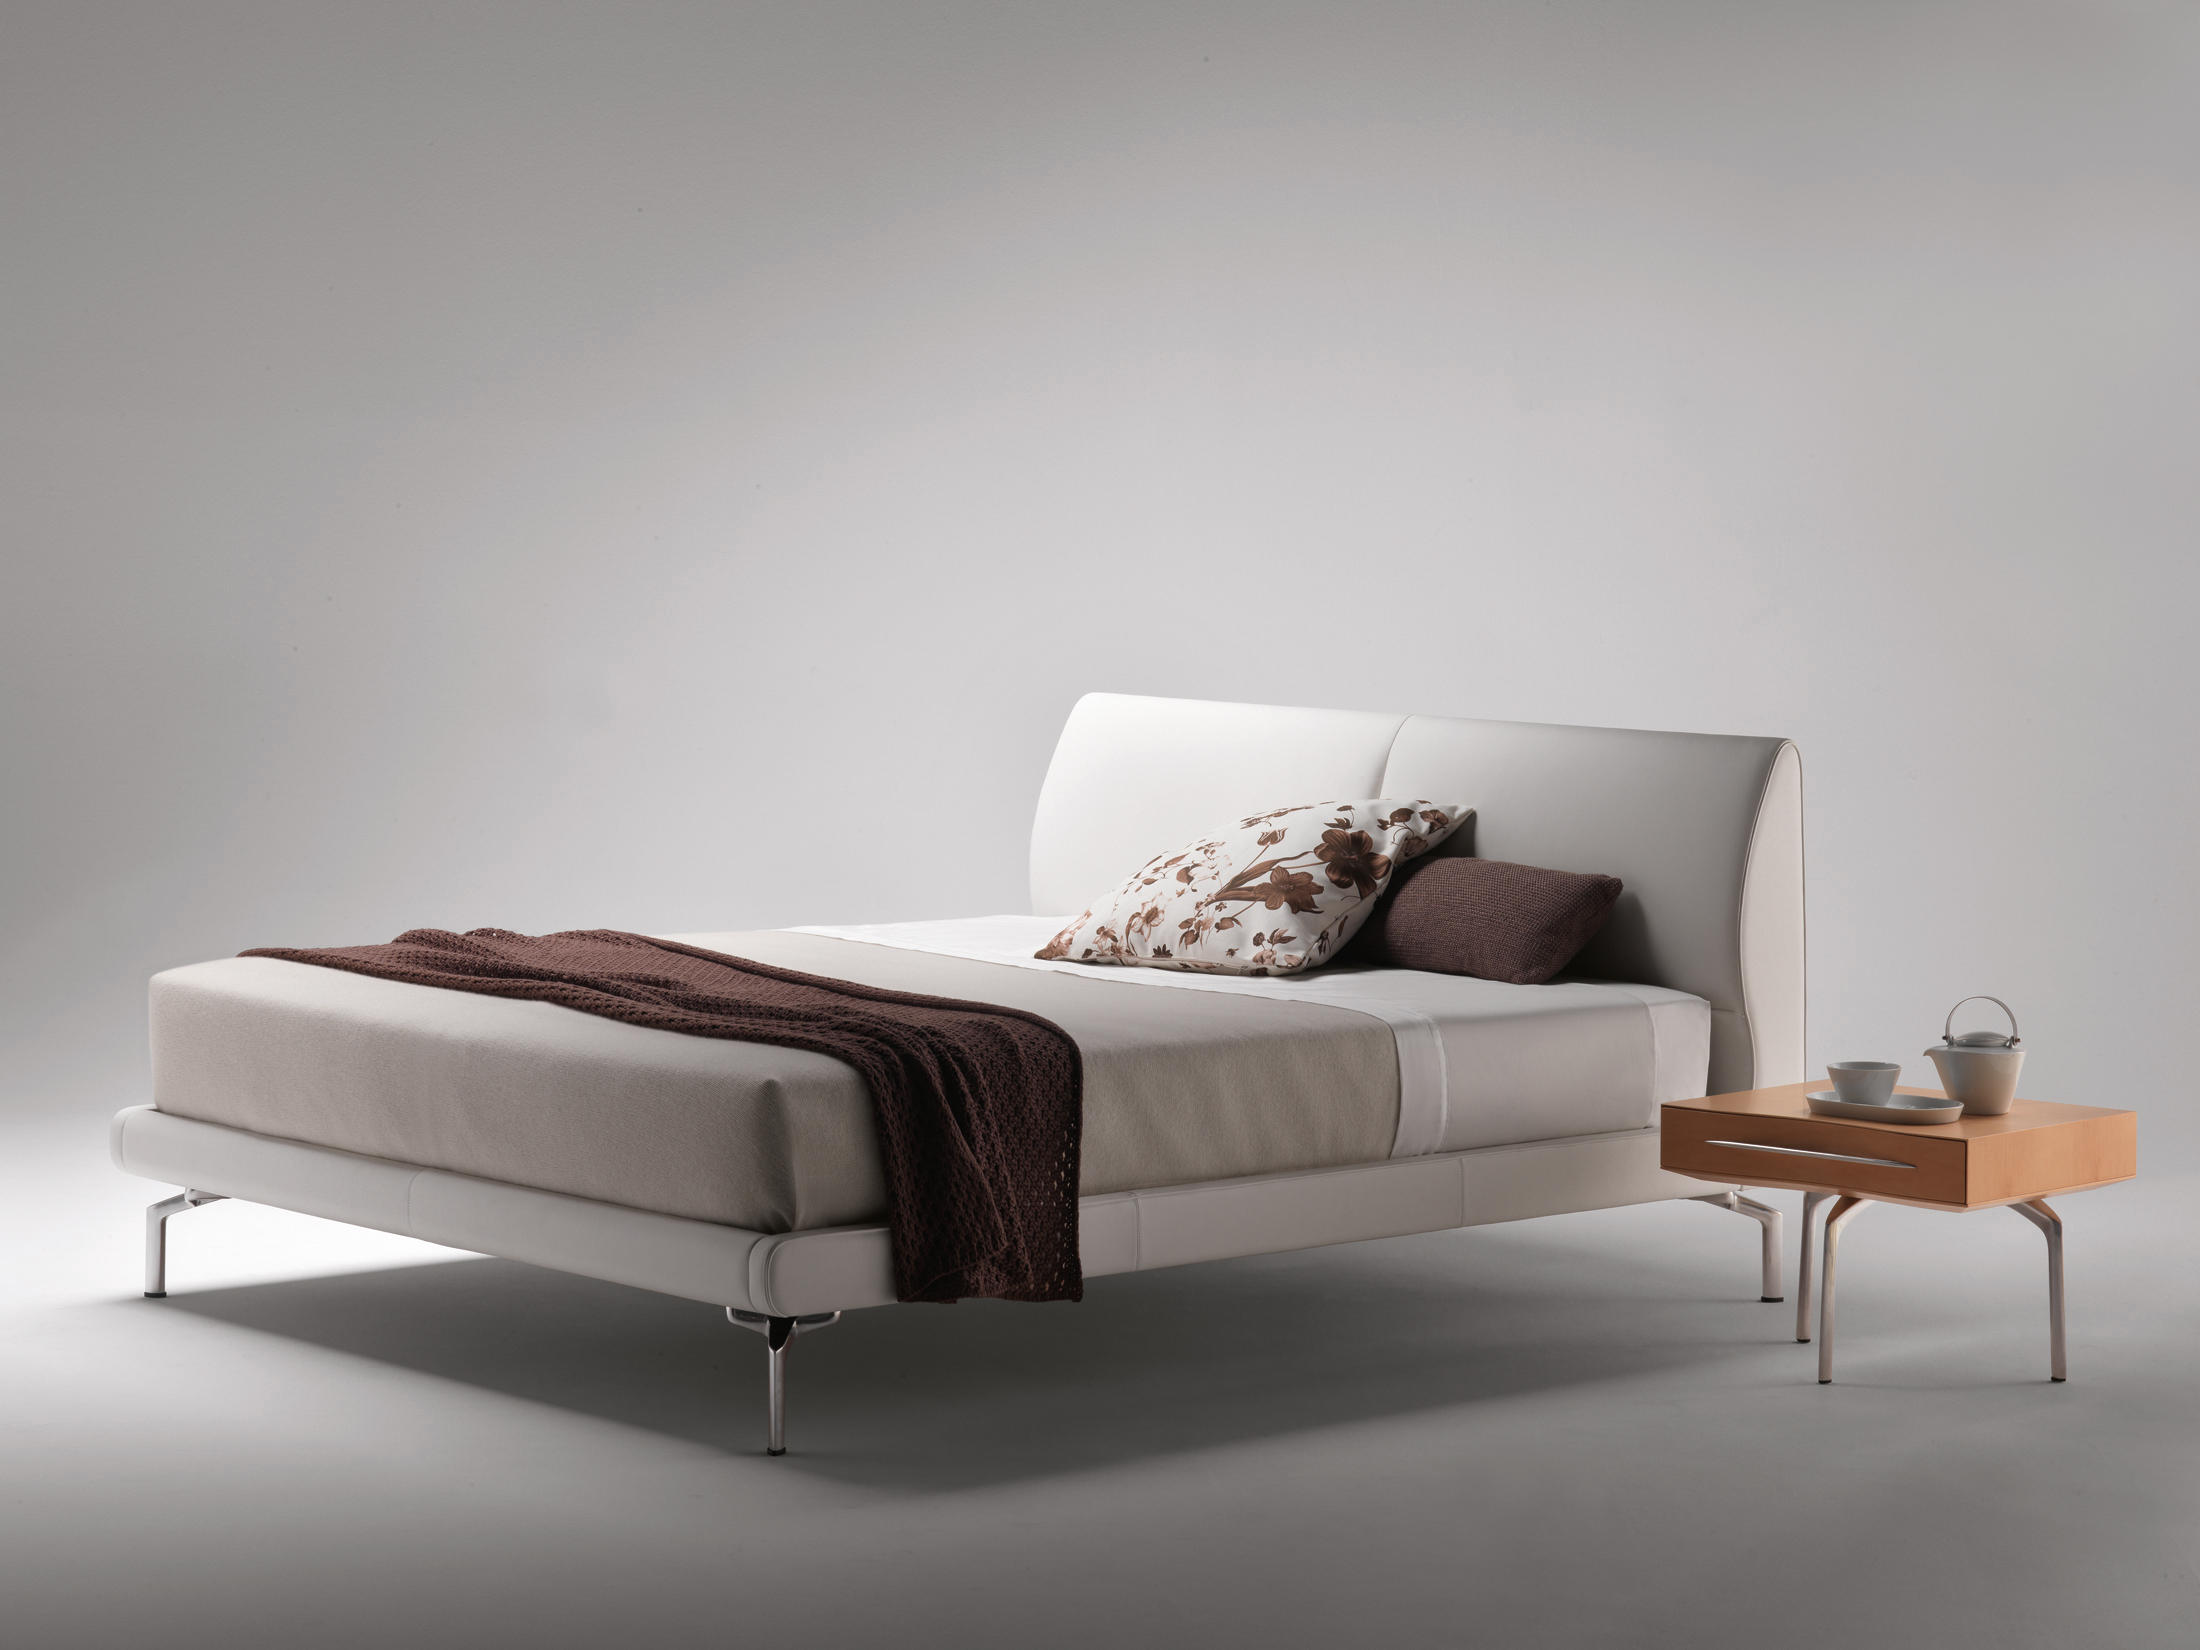 EOSONNO - Betten von Poltrona Frau | Architonic